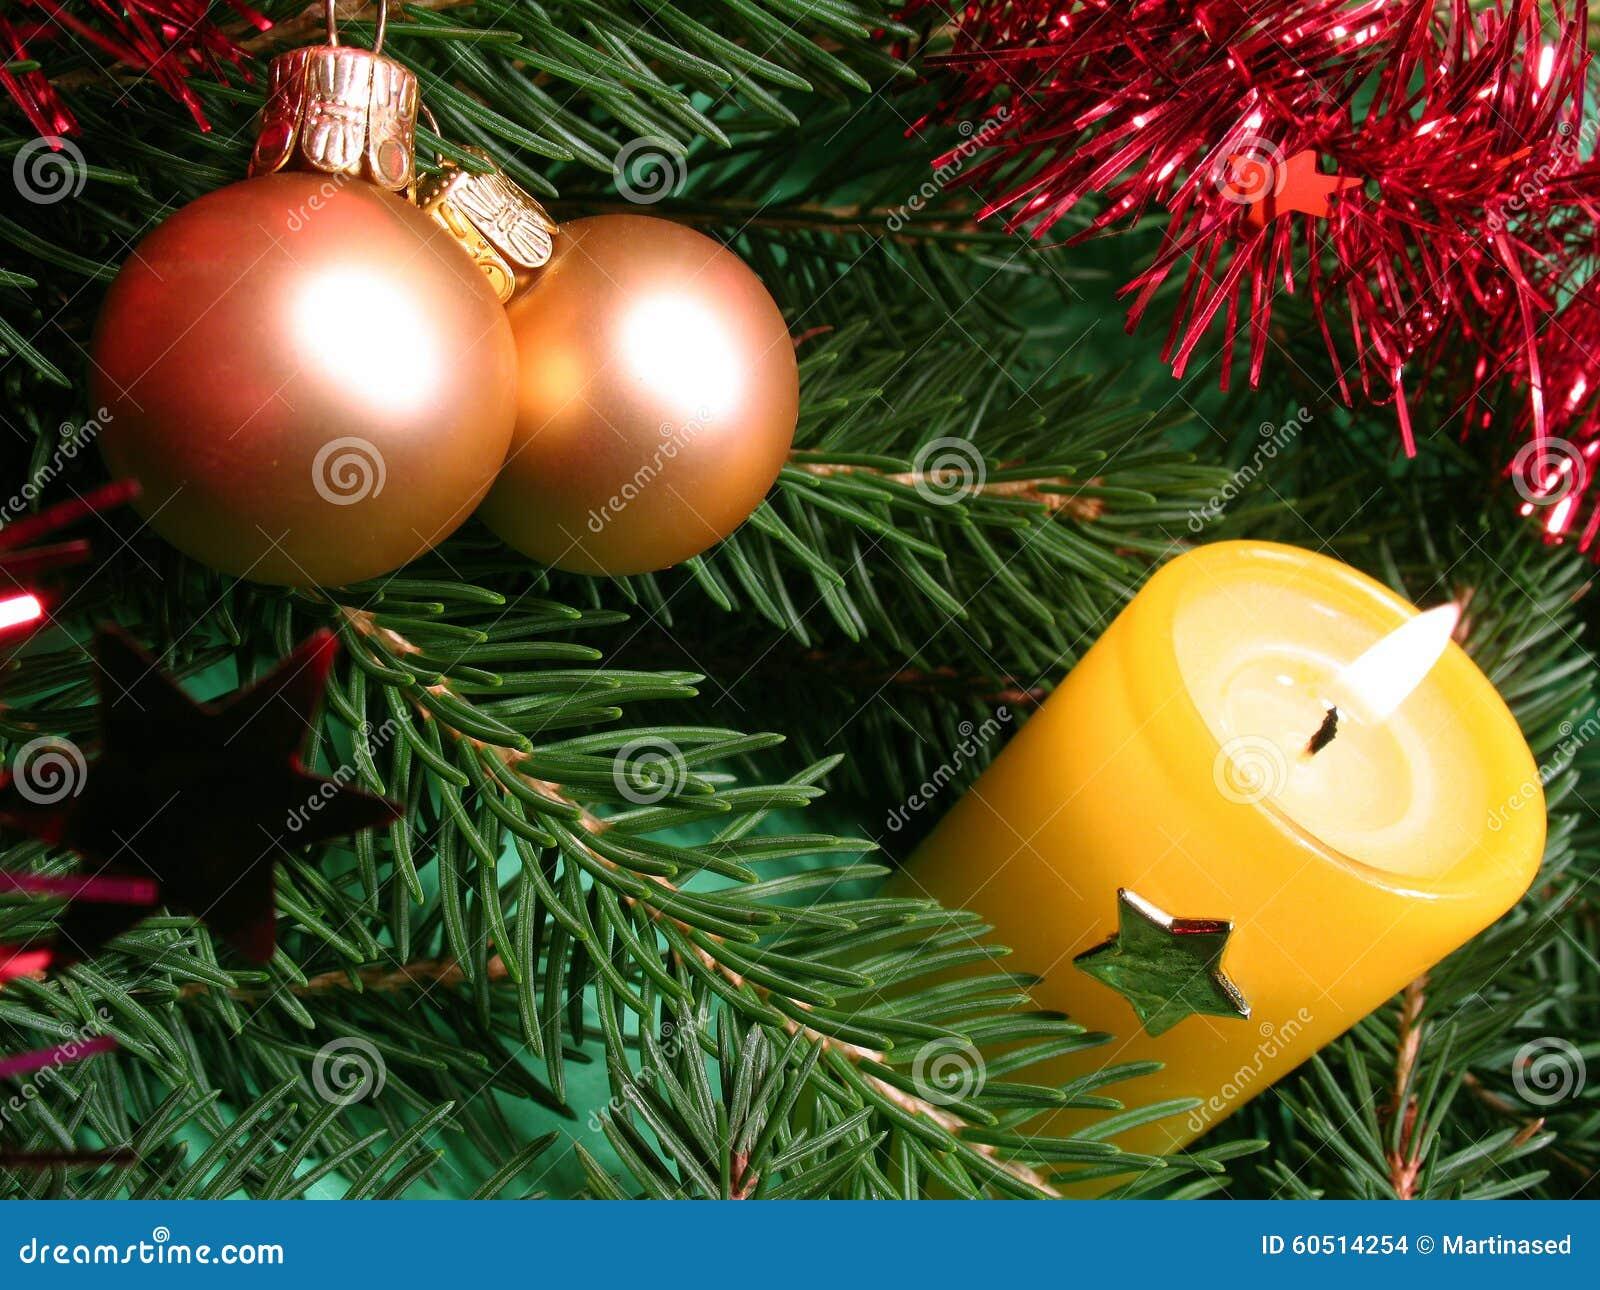 Background candle christmas decoration gift golden xmas